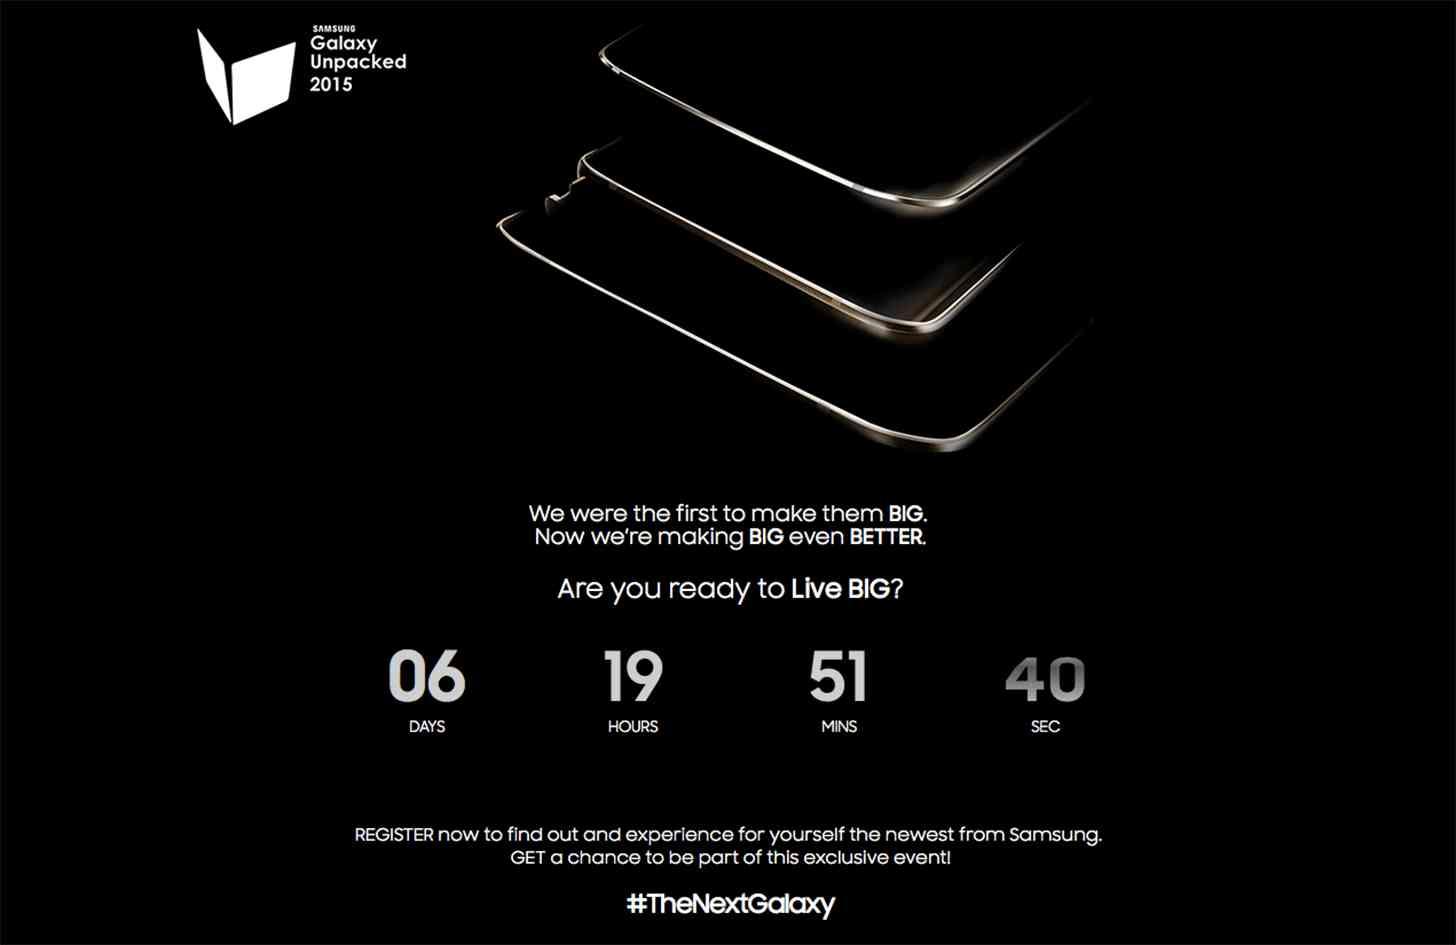 Samsung August 13 Galaxy Note 5 event teaser